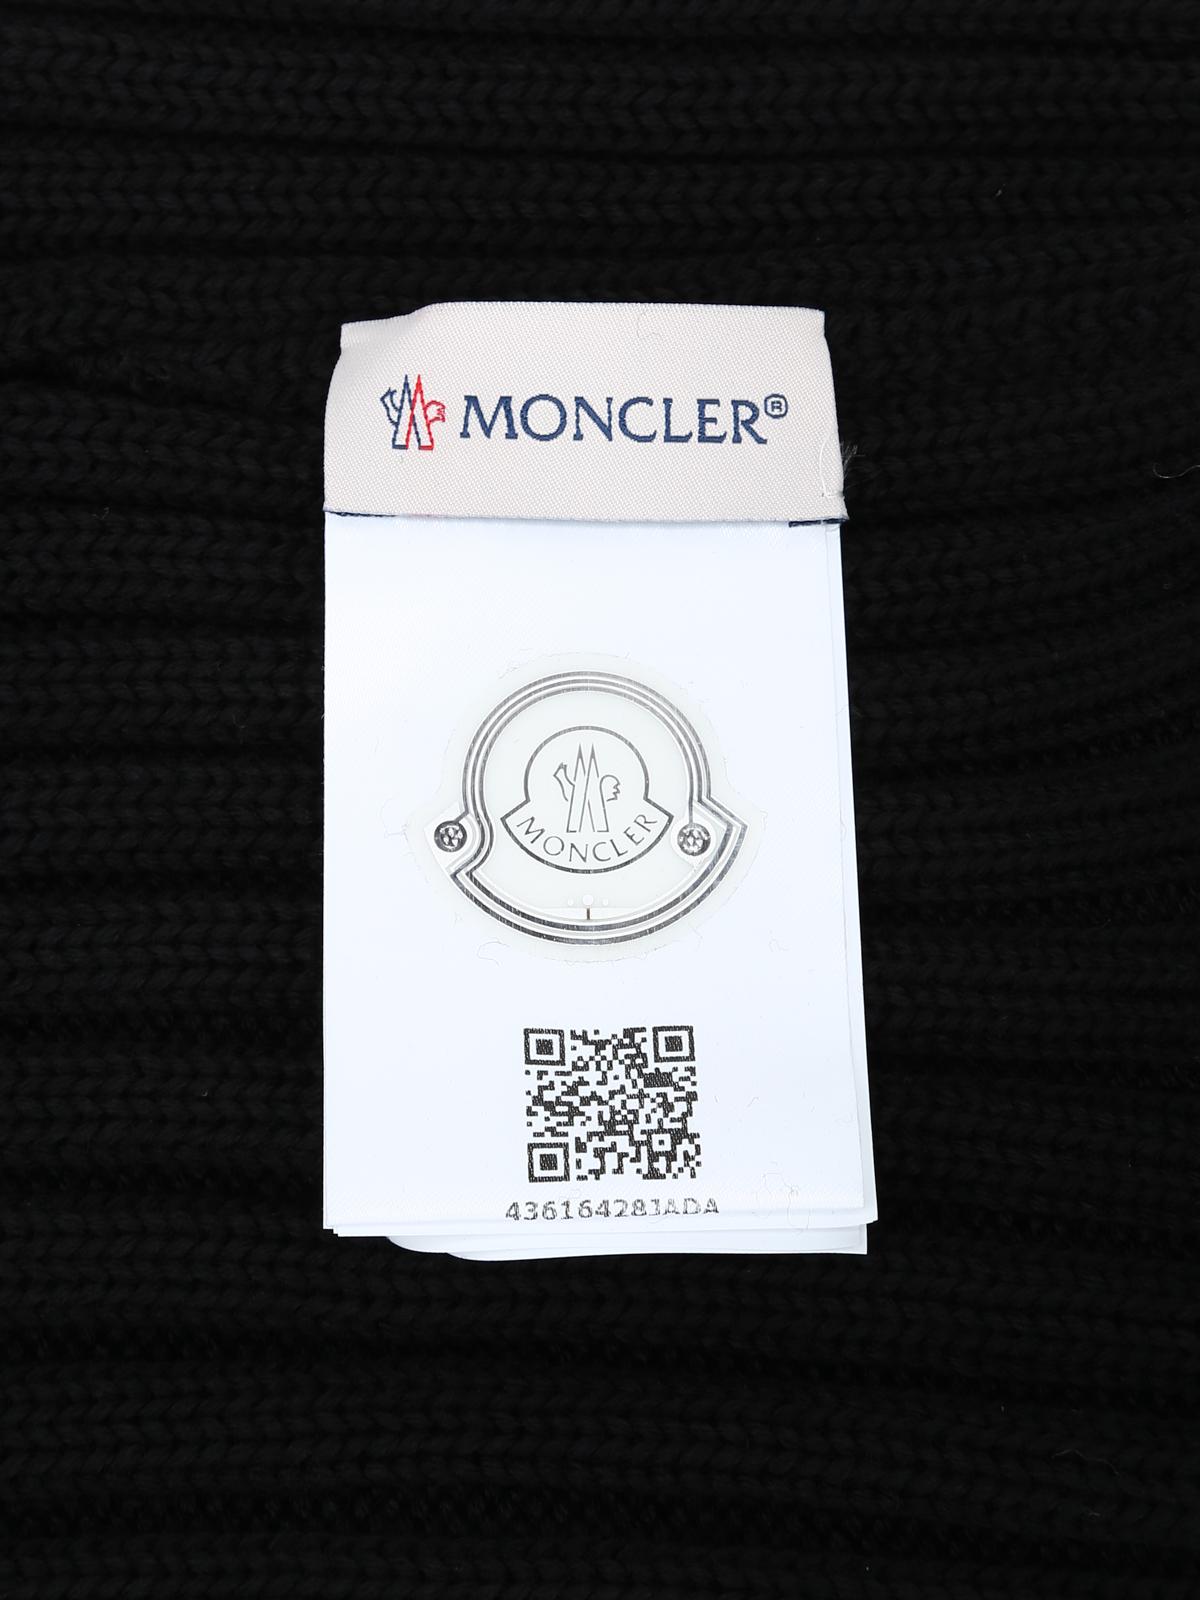 76025f8206679 Moncler - Fur pompom black ribbed wool beanie - beanies - D2 093 ...